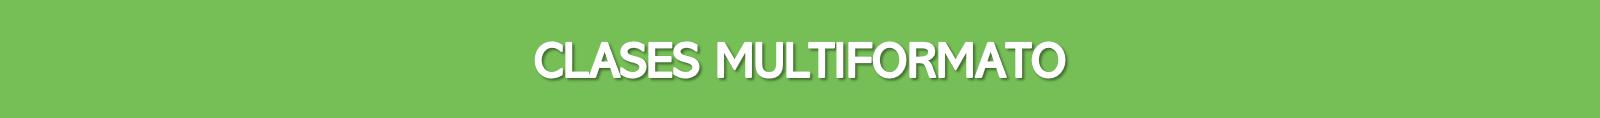 banner clases multiformato tu plaza v2